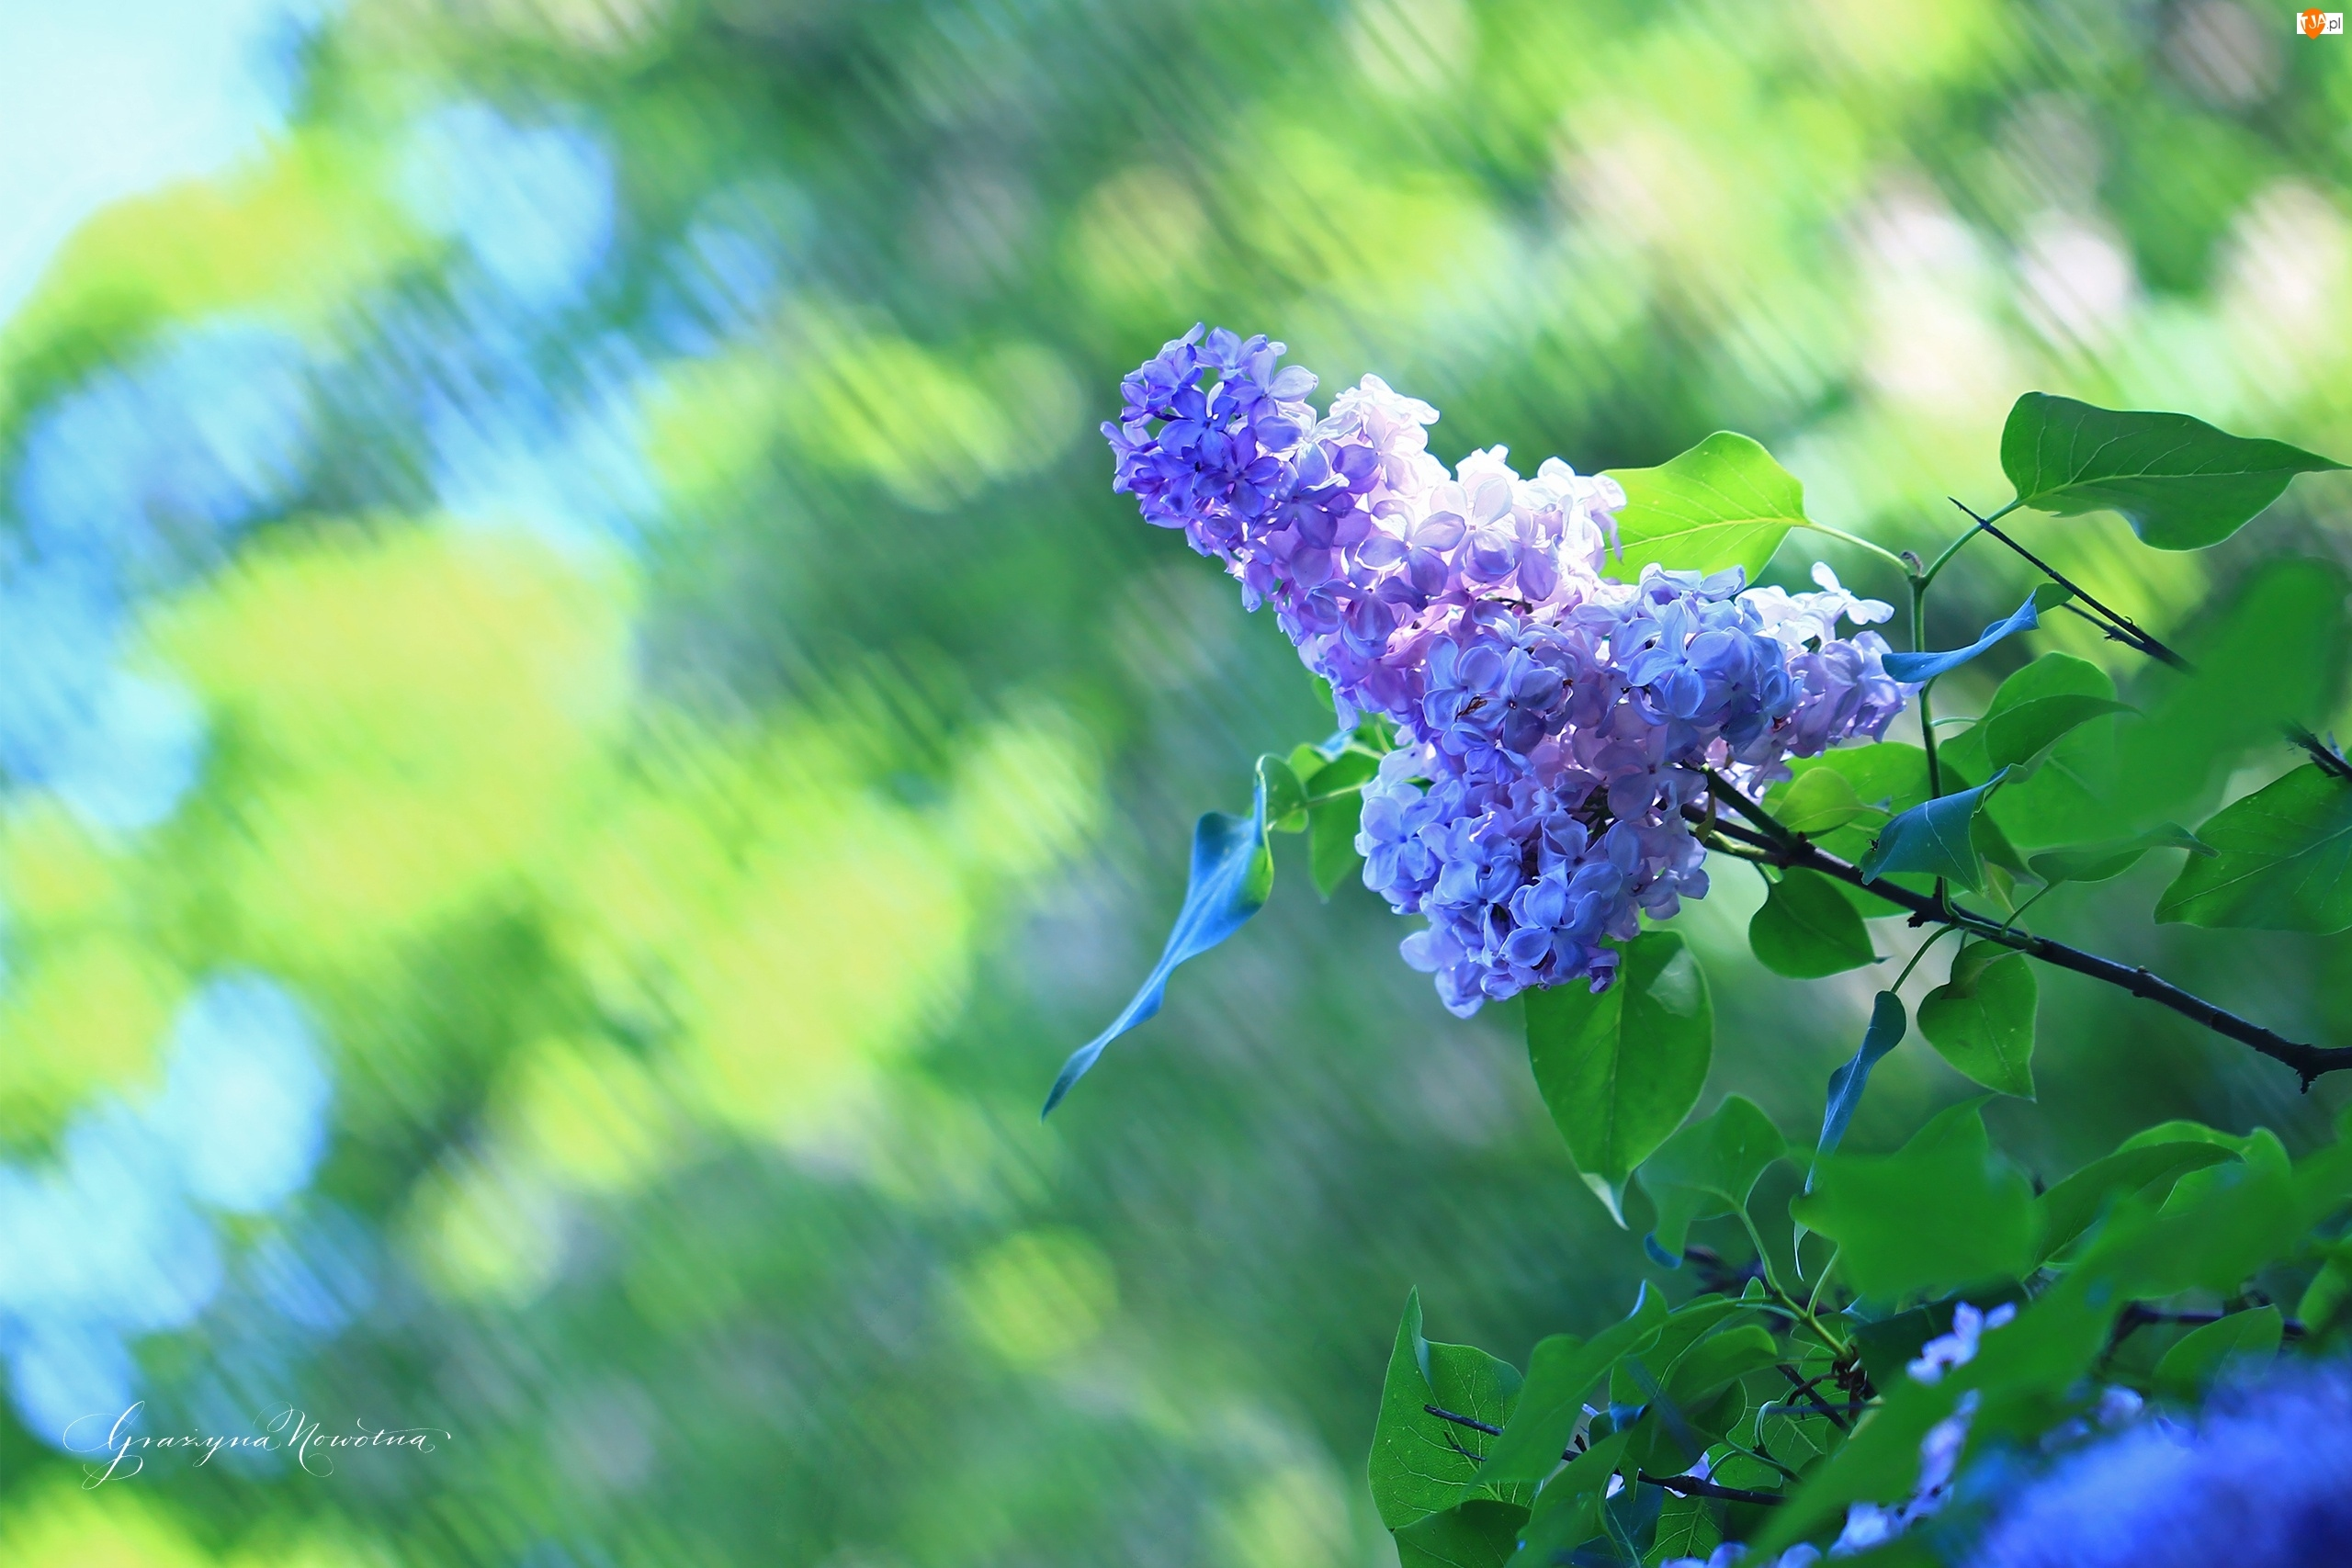 Fioletowy, Krzew, Bez, Kwiaty